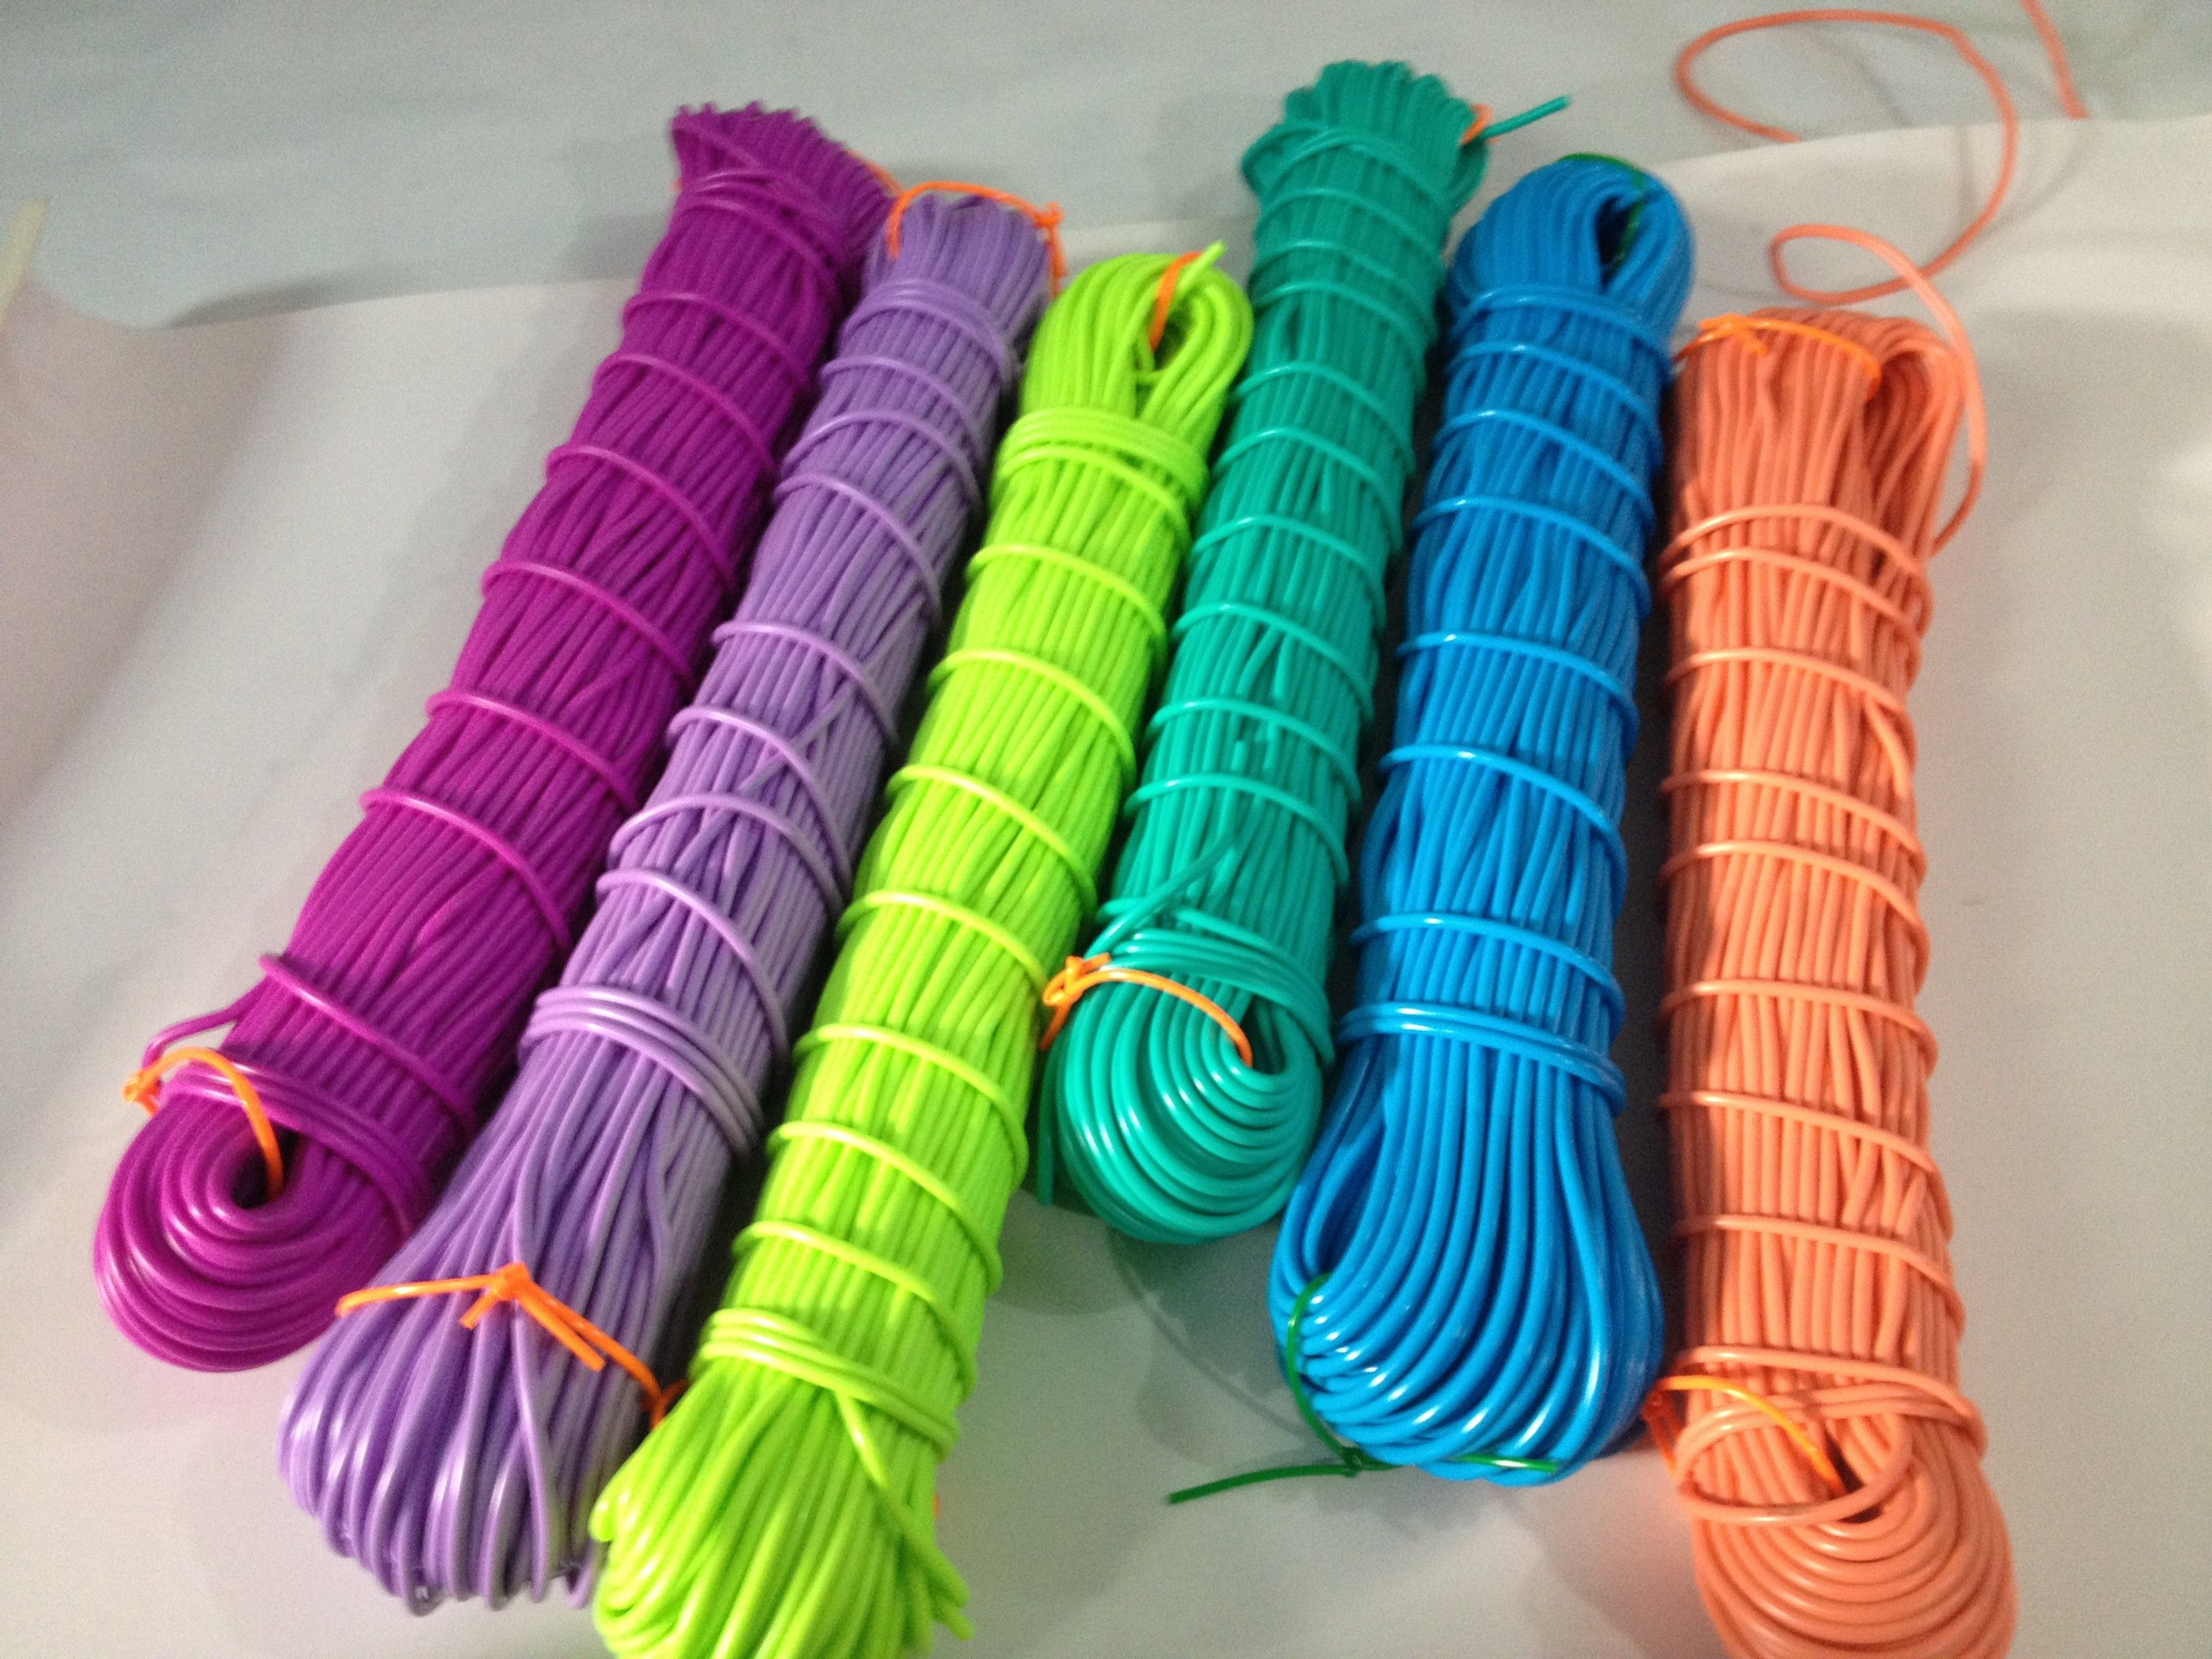 Manguerilla de pvc s lido para tejer sillas estilo for Silla acapulco ikea